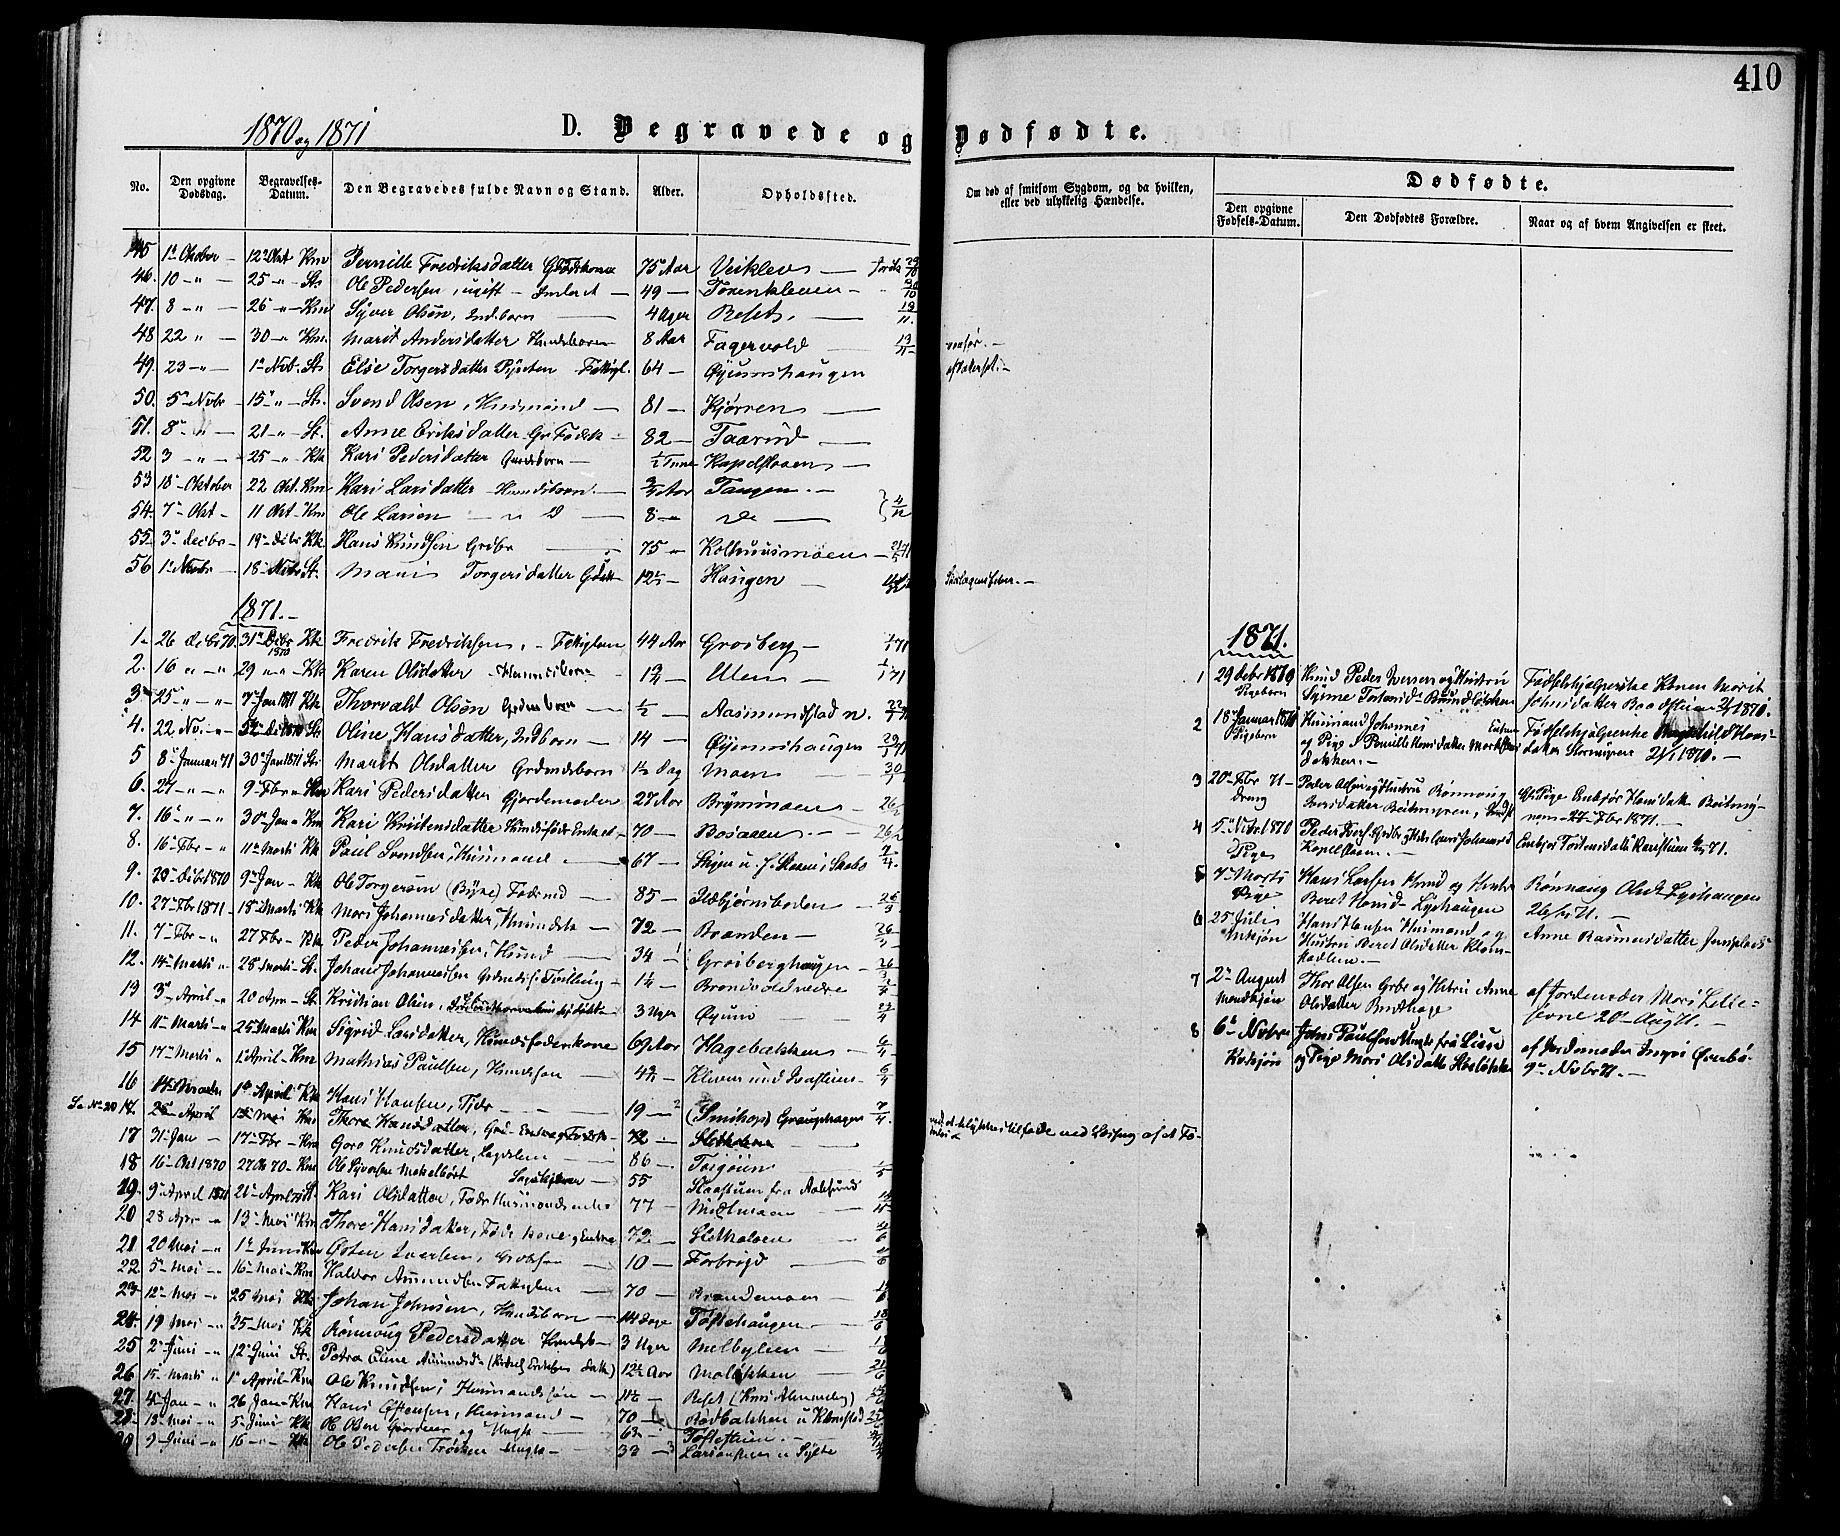 SAH, Nord-Fron prestekontor, Ministerialbok nr. 2, 1865-1883, s. 410